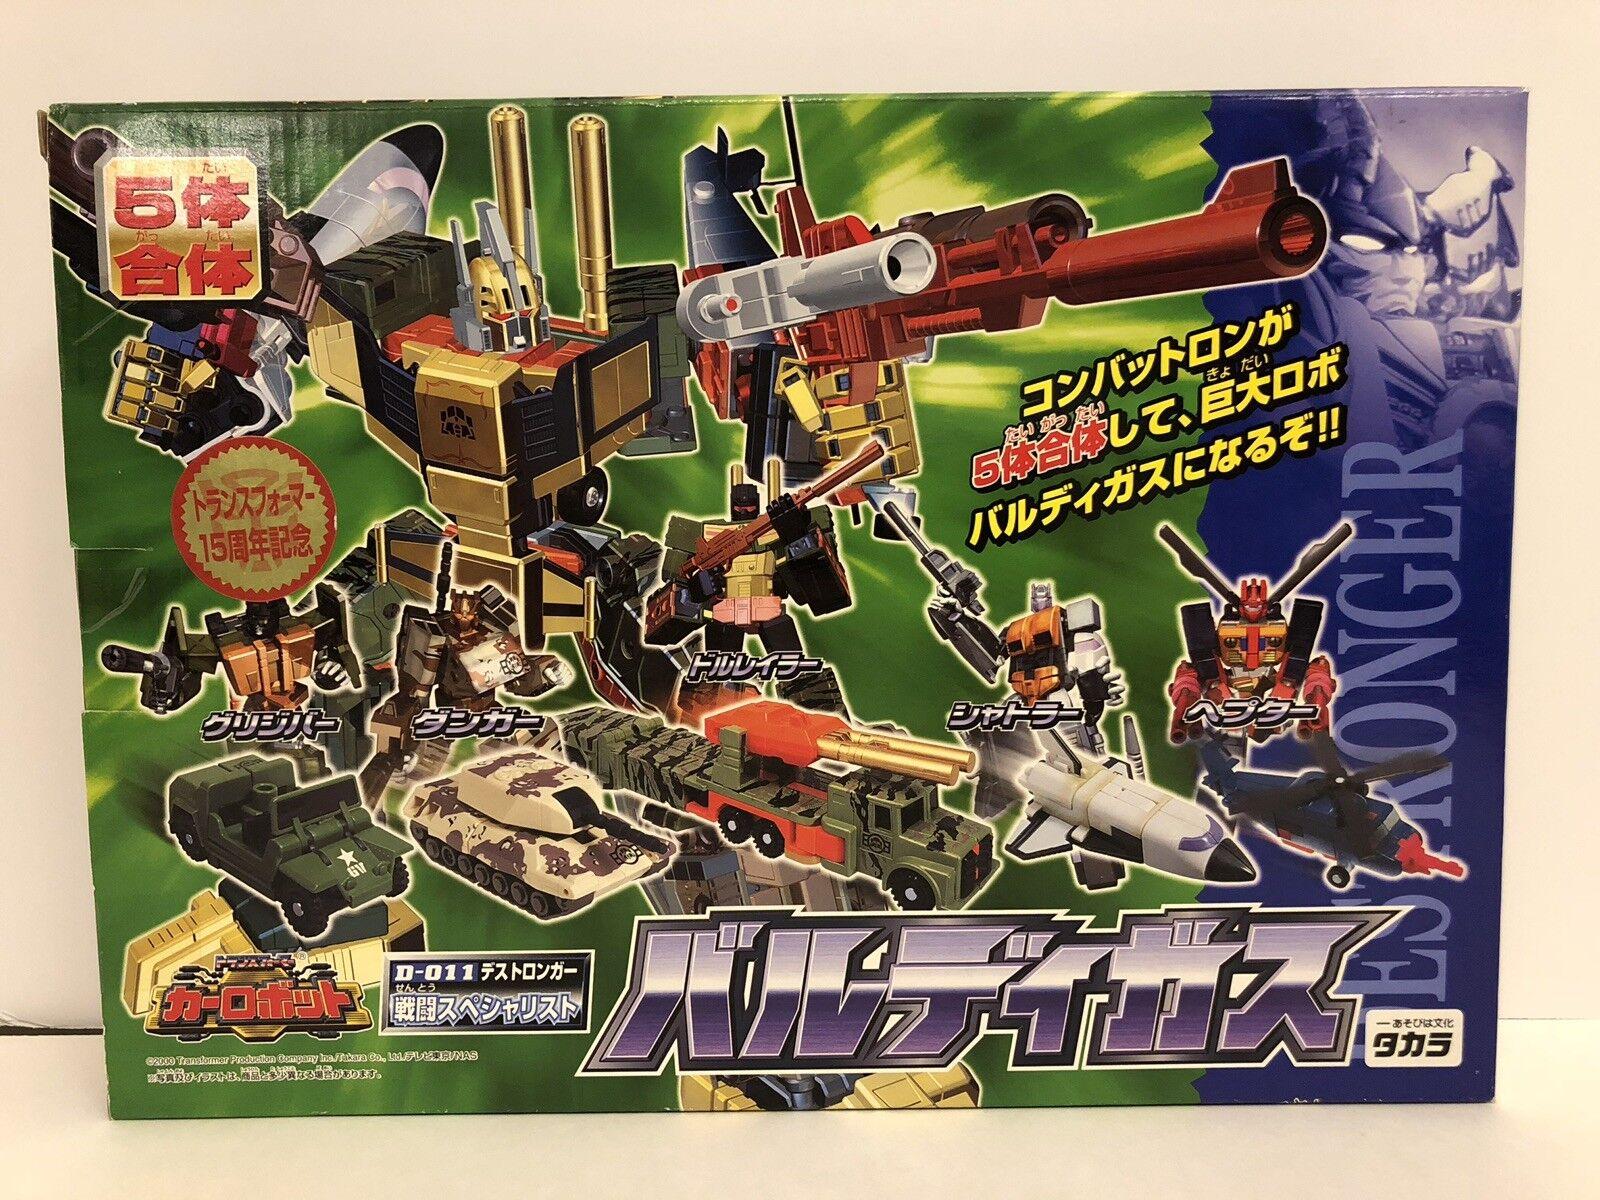 Transformers Car Robots Takara Ruination Japanese